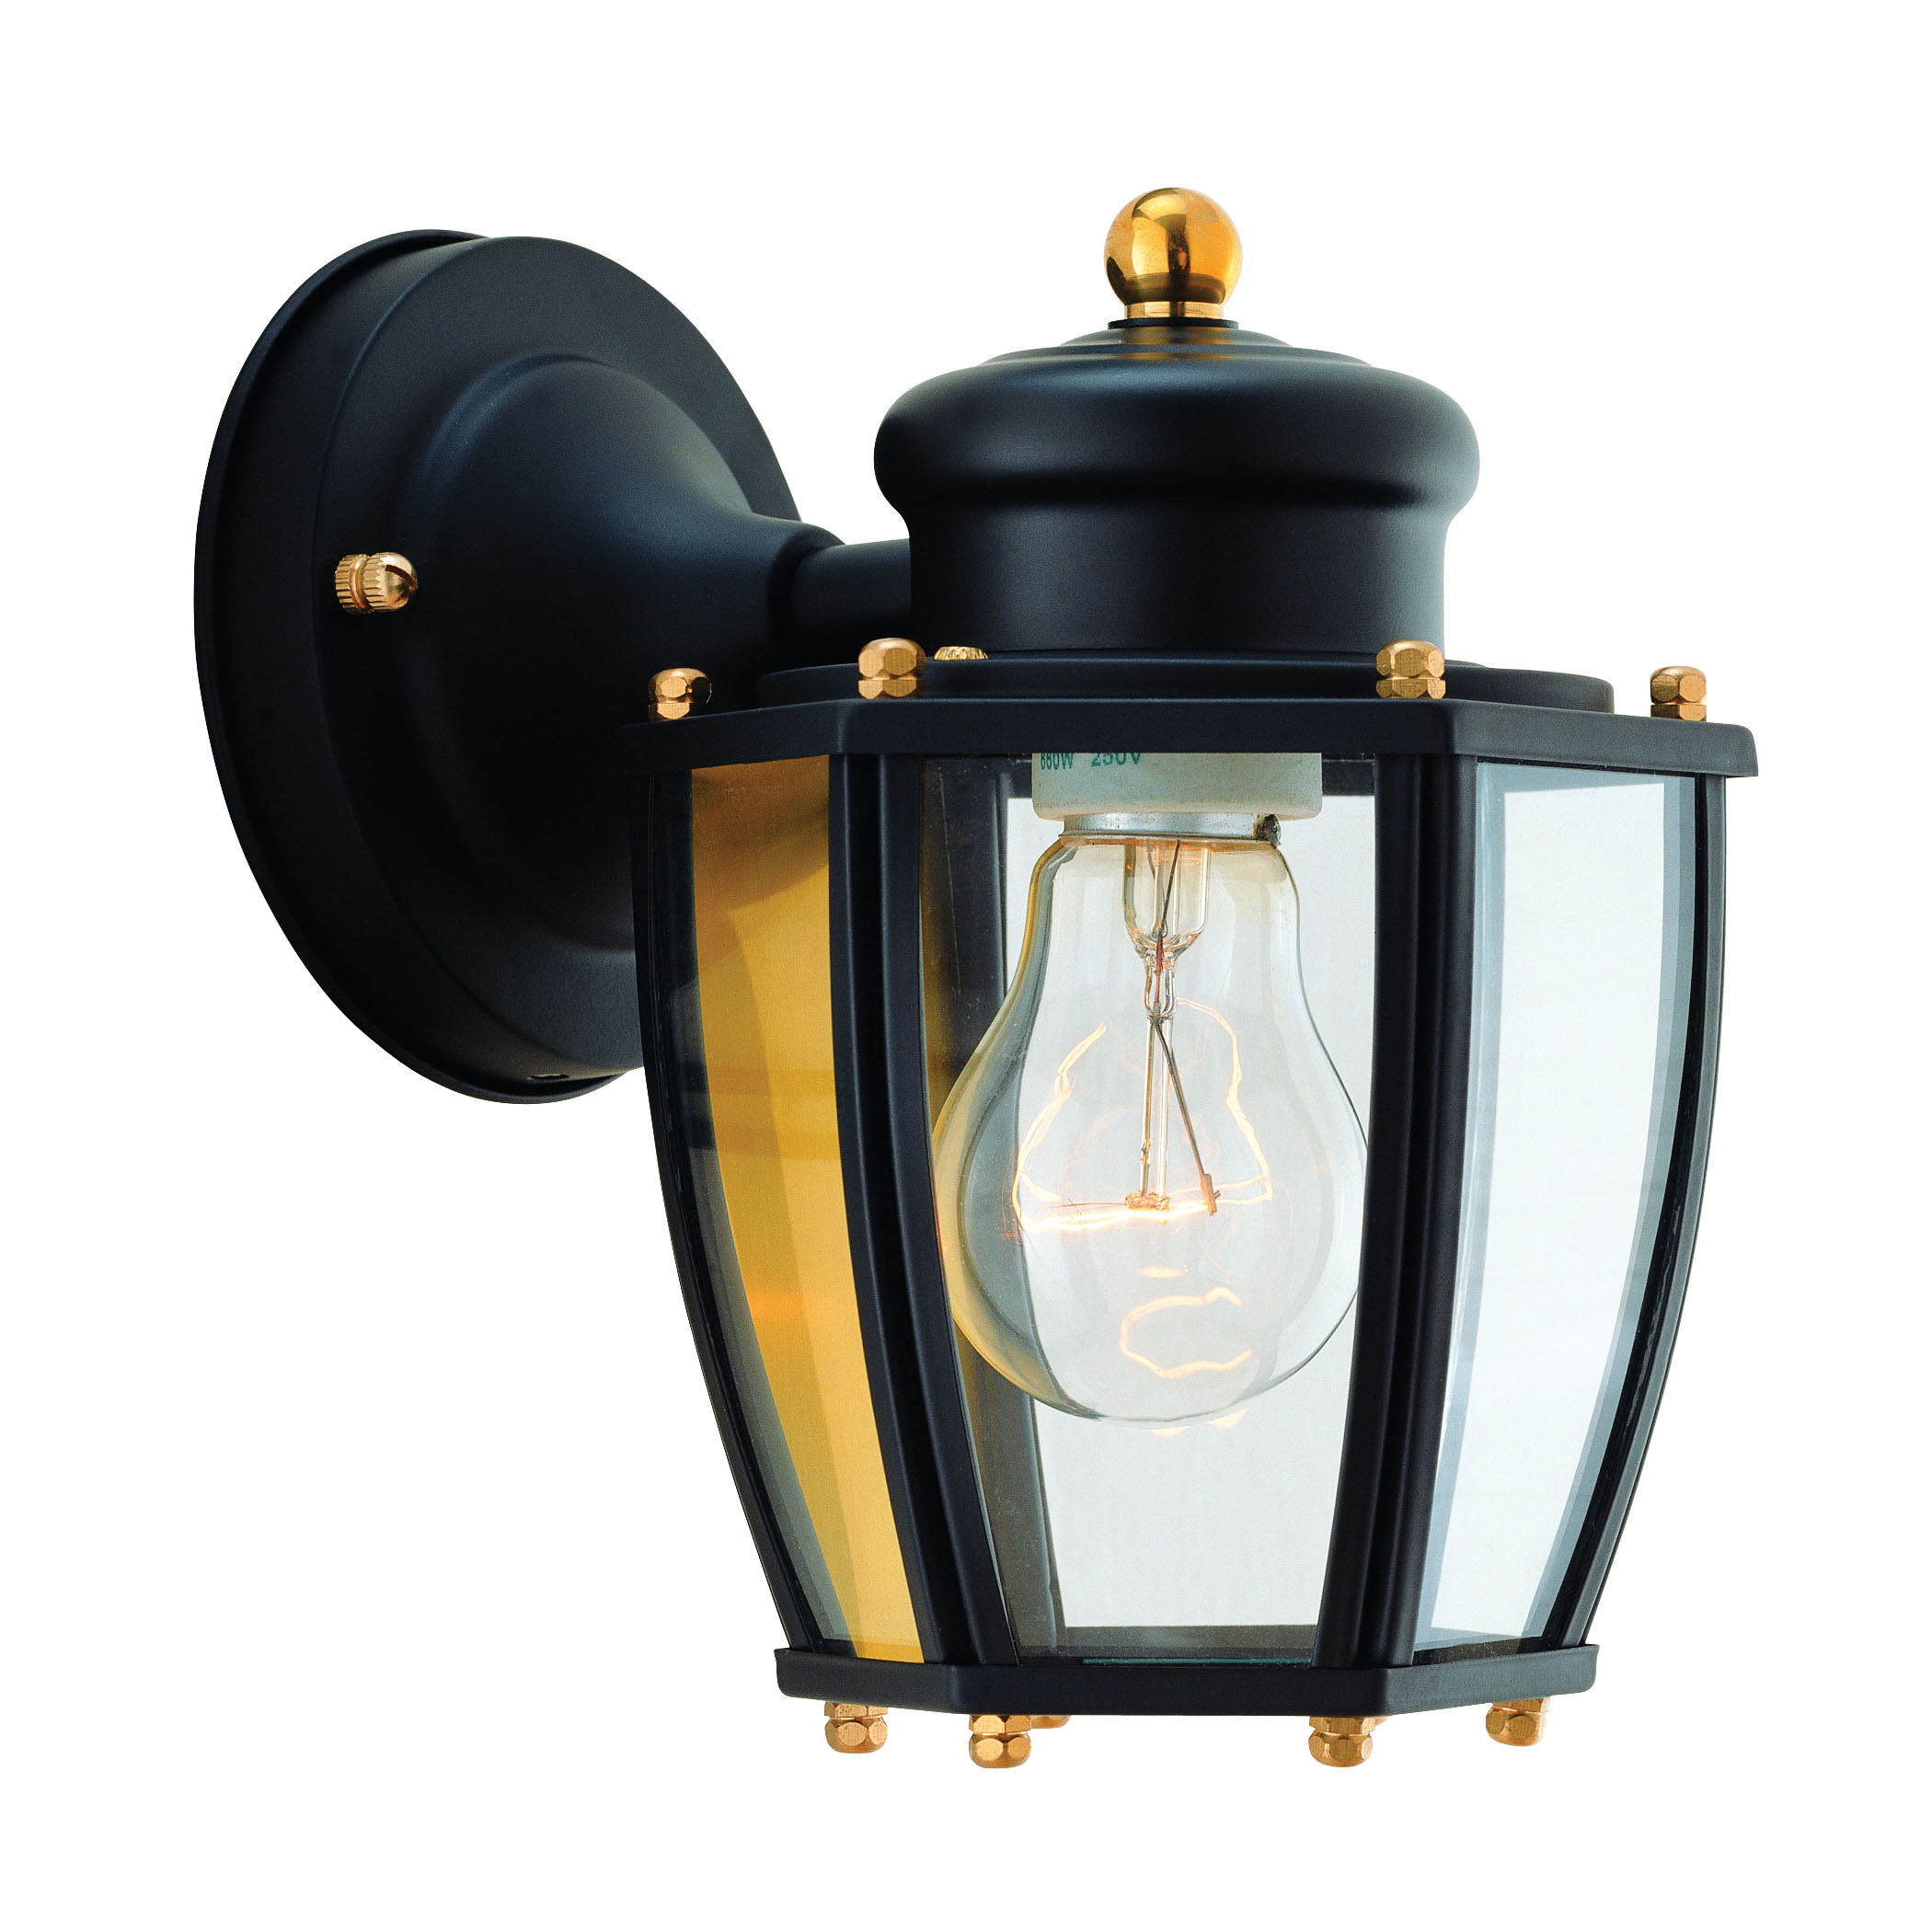 Picture of Boston Harbor HV-66961-BK Porch Light Fixture, CFL Lamp, Steel Fixture, Black